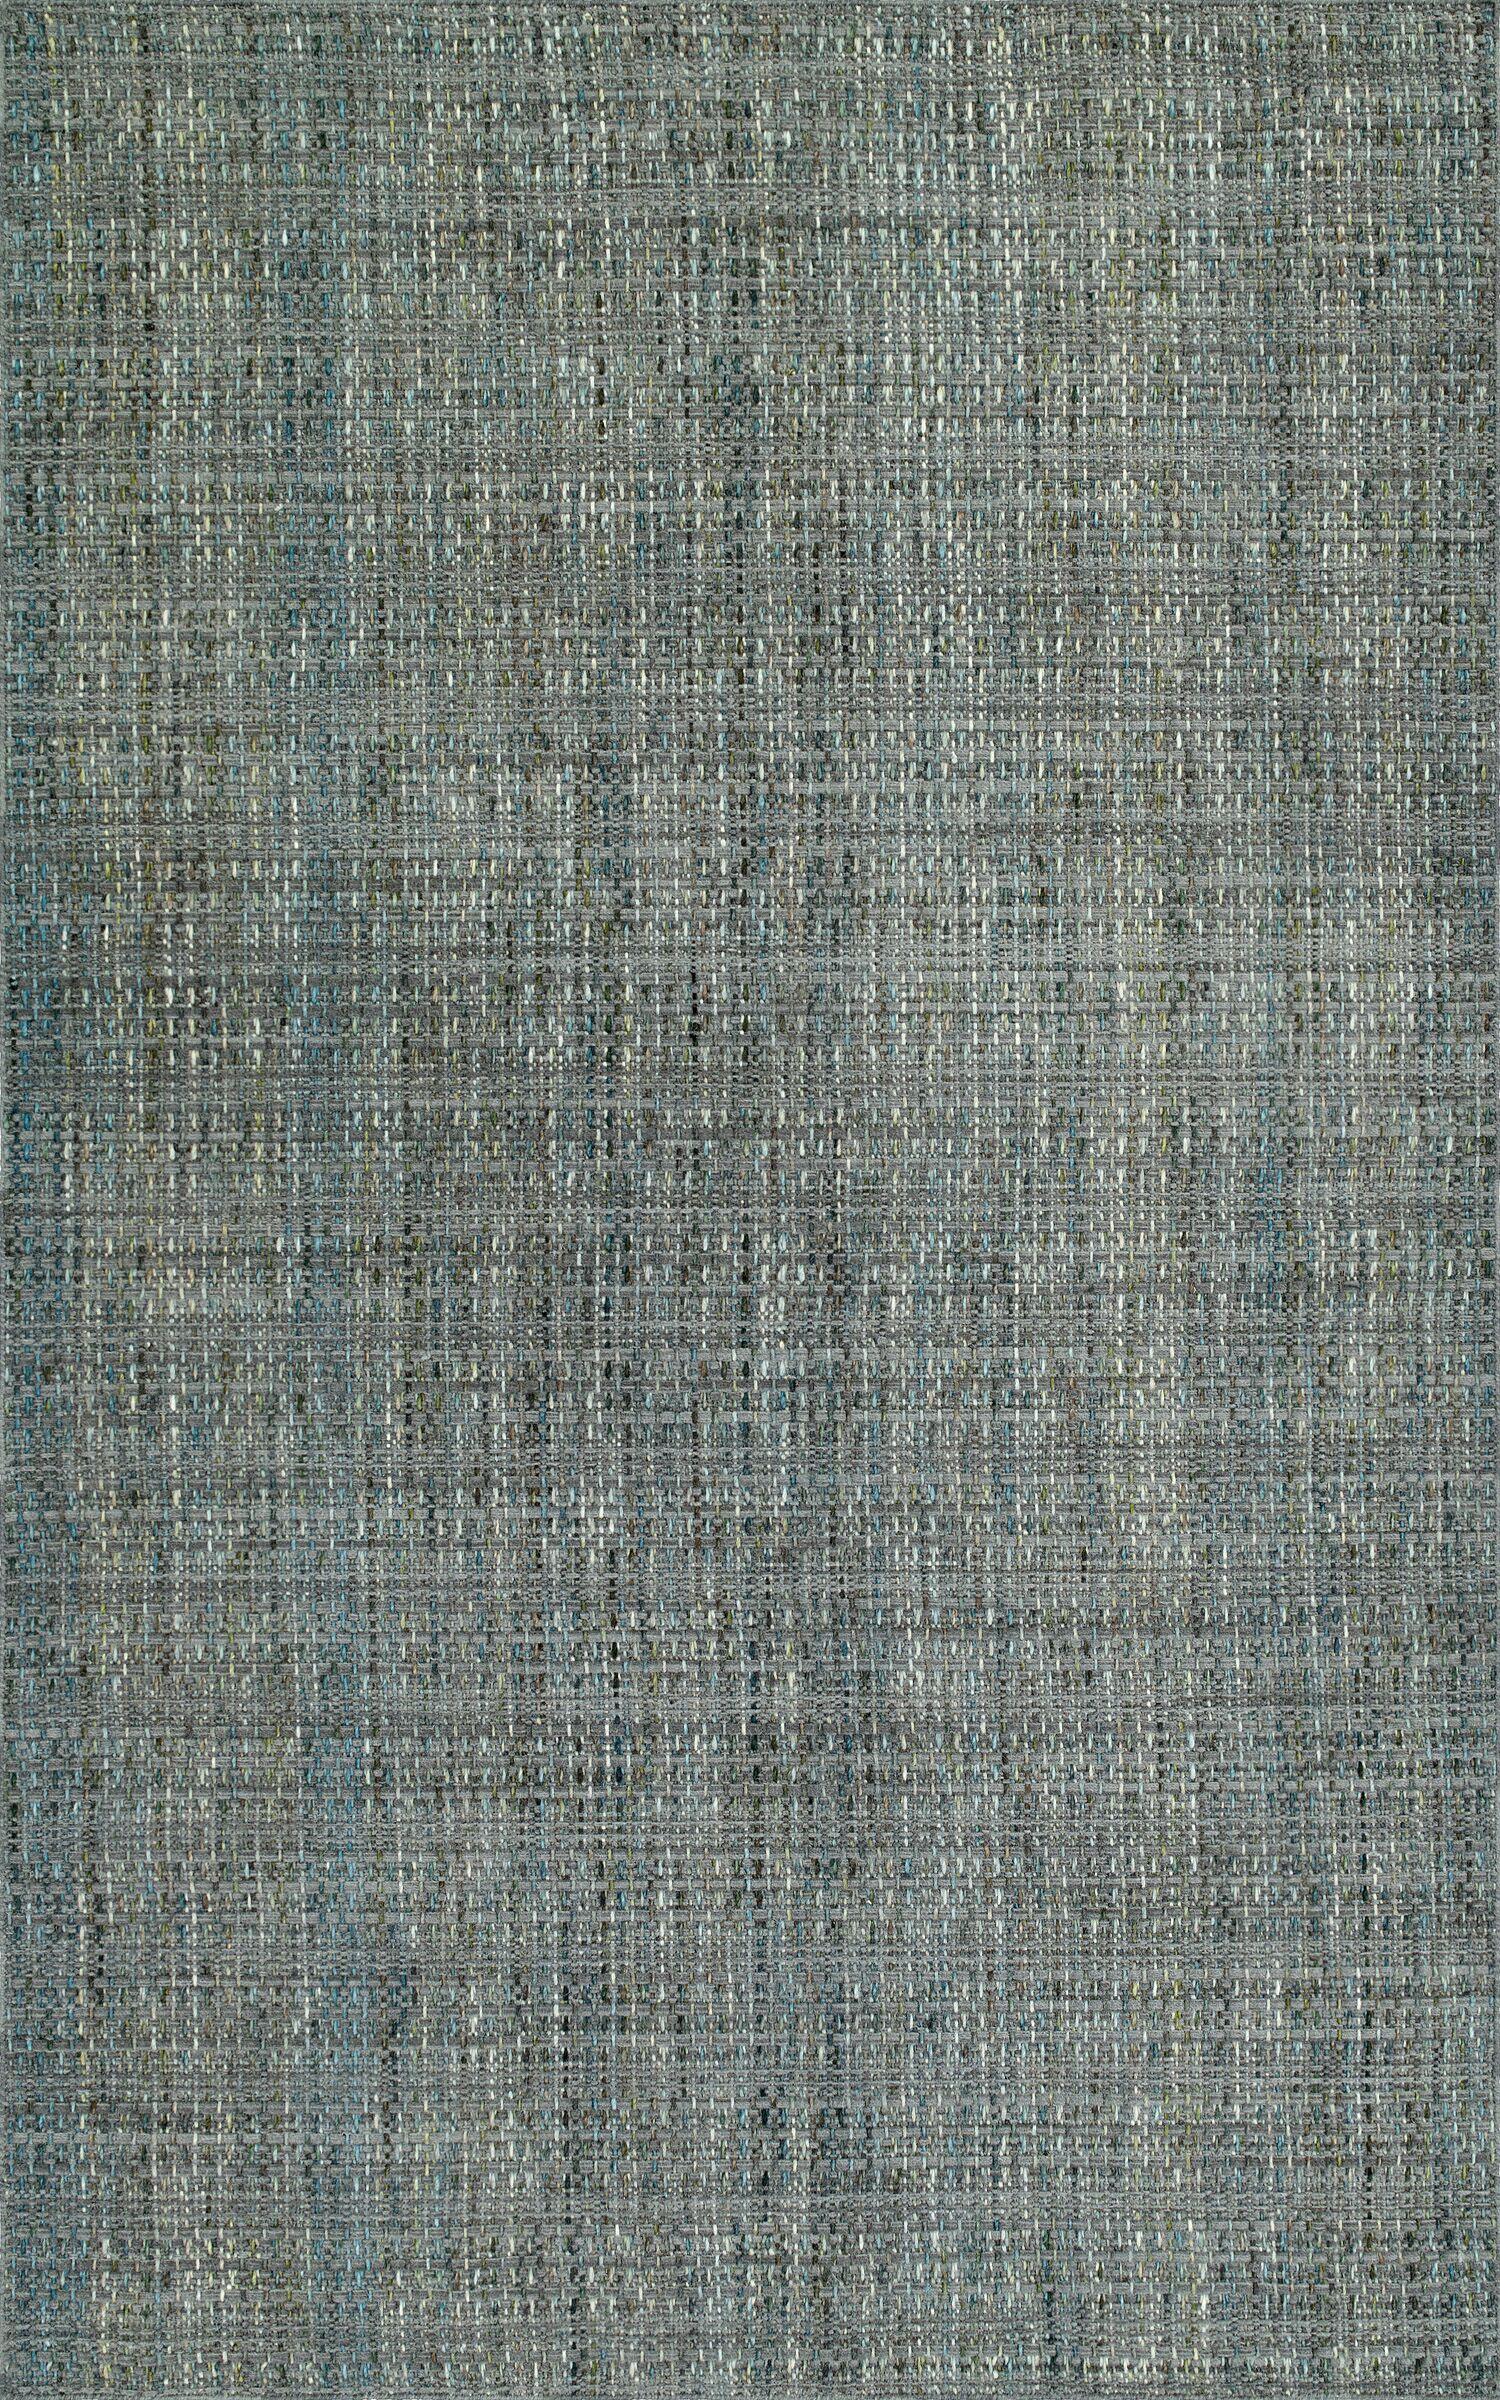 Nepal Hand-Loomed Gray Area Rug Rug Size: Rectangle 3'6